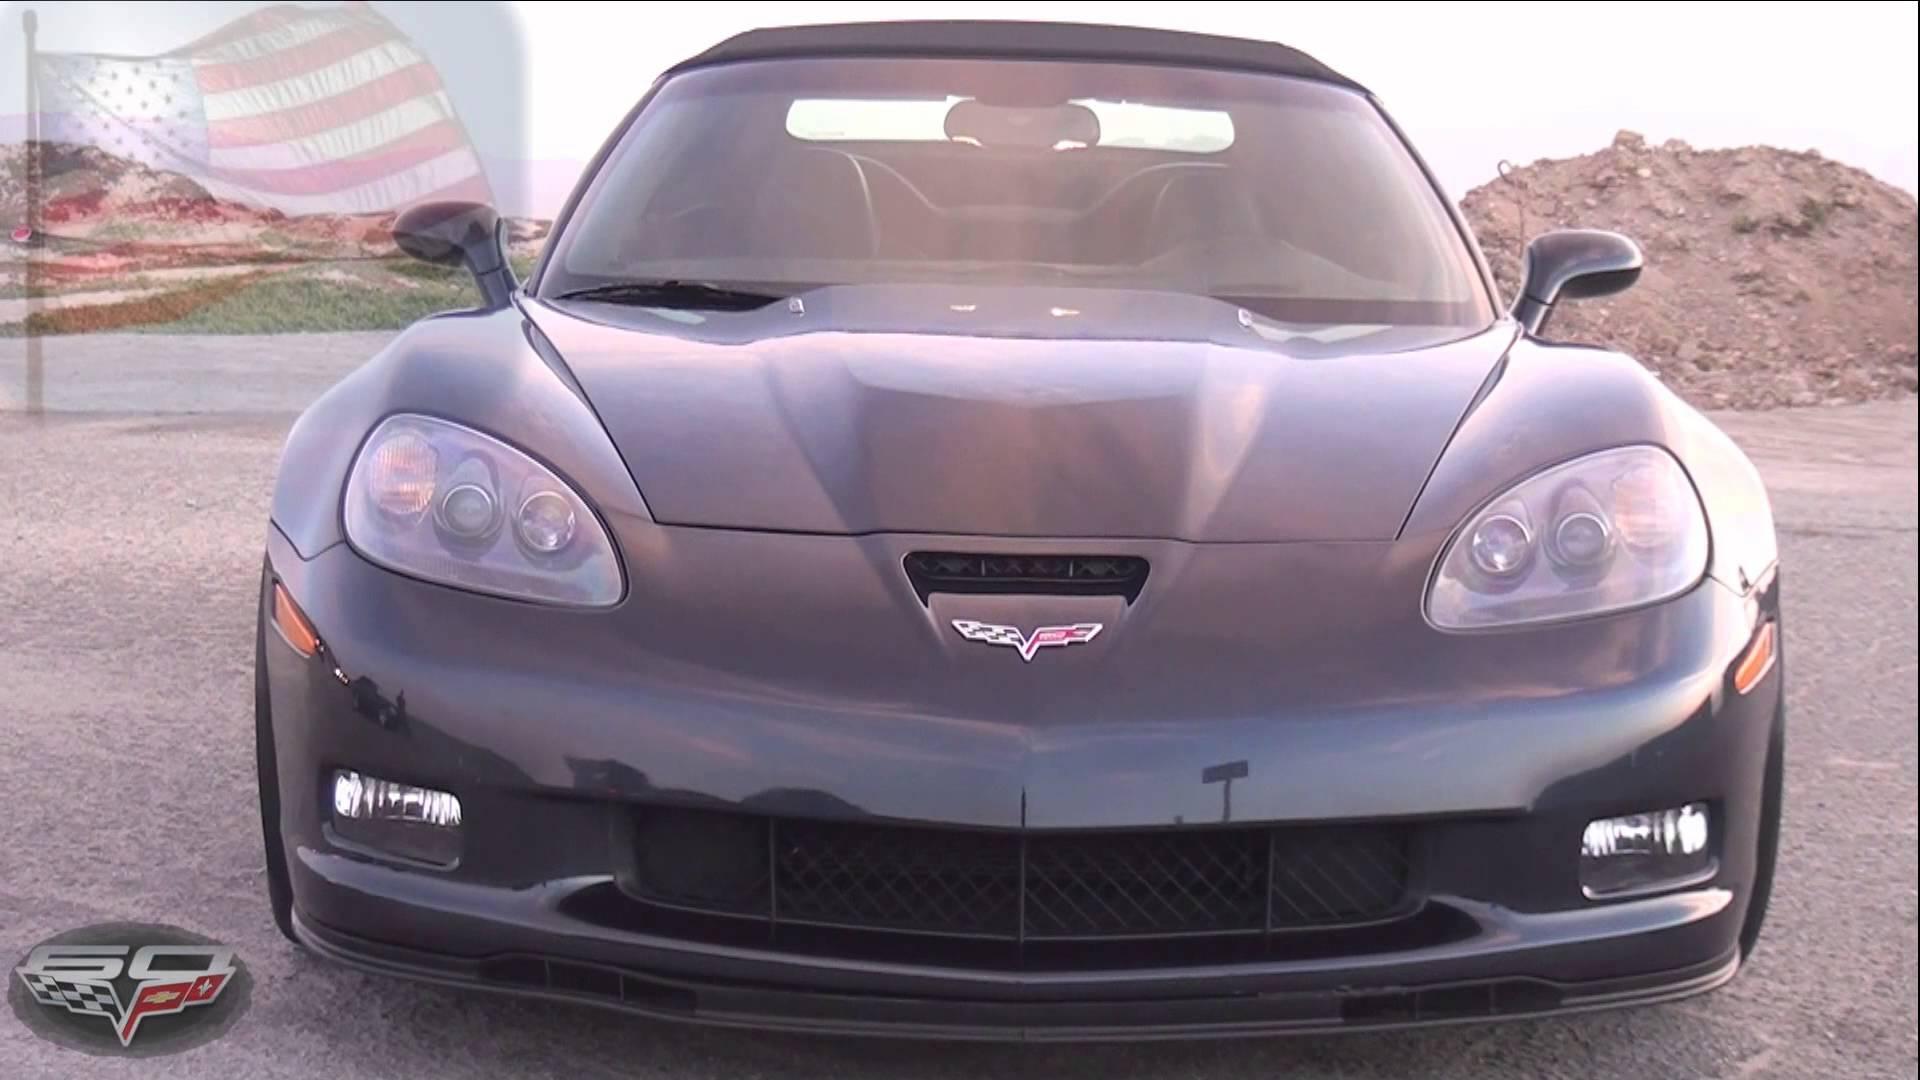 [Chevrolet Corvette C6] 427 LS7